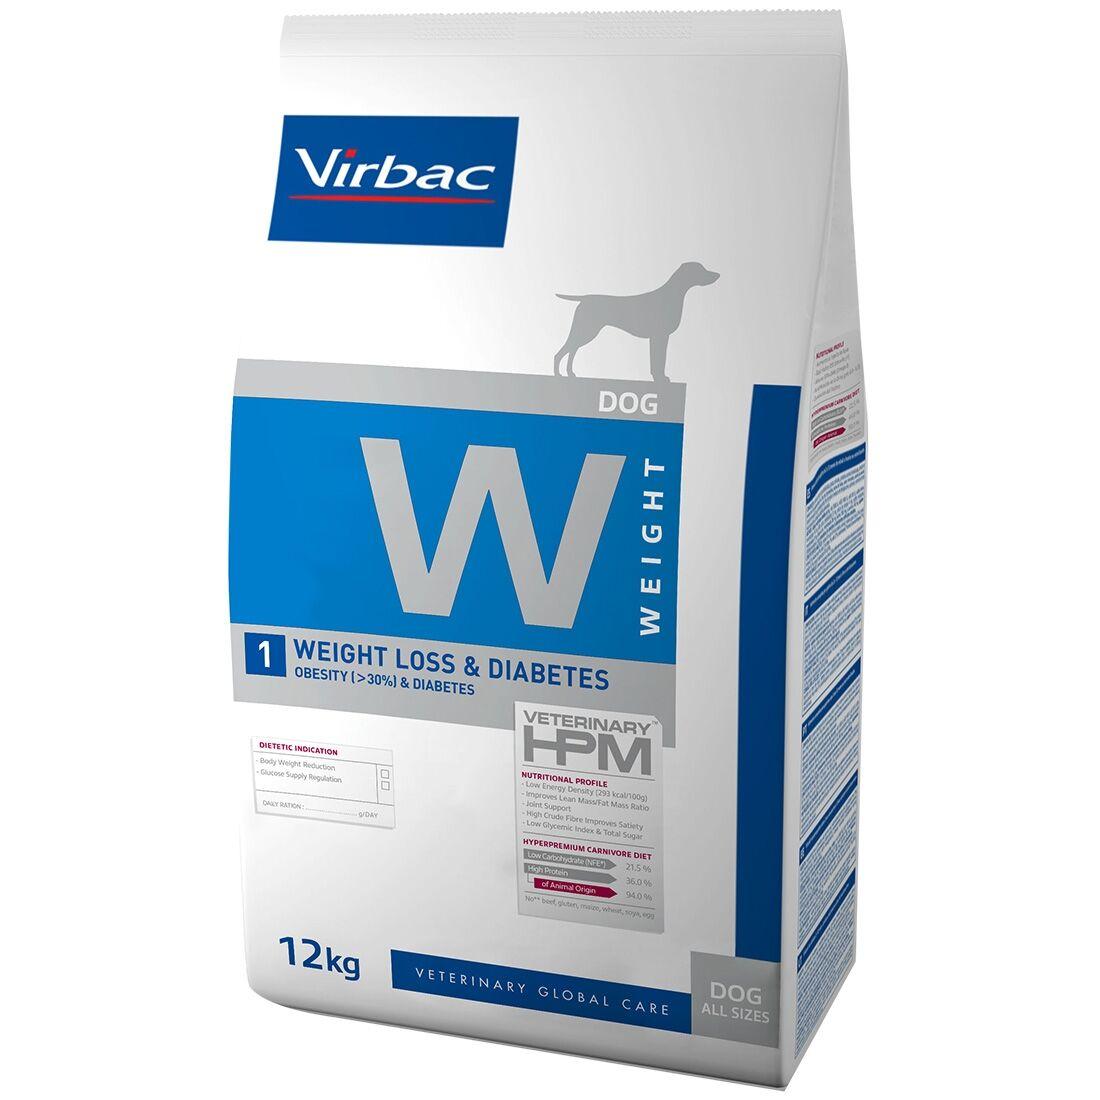 Virbac Veterinary HPM Weight Loss & Diabetes Dog Contenance : 7 kg